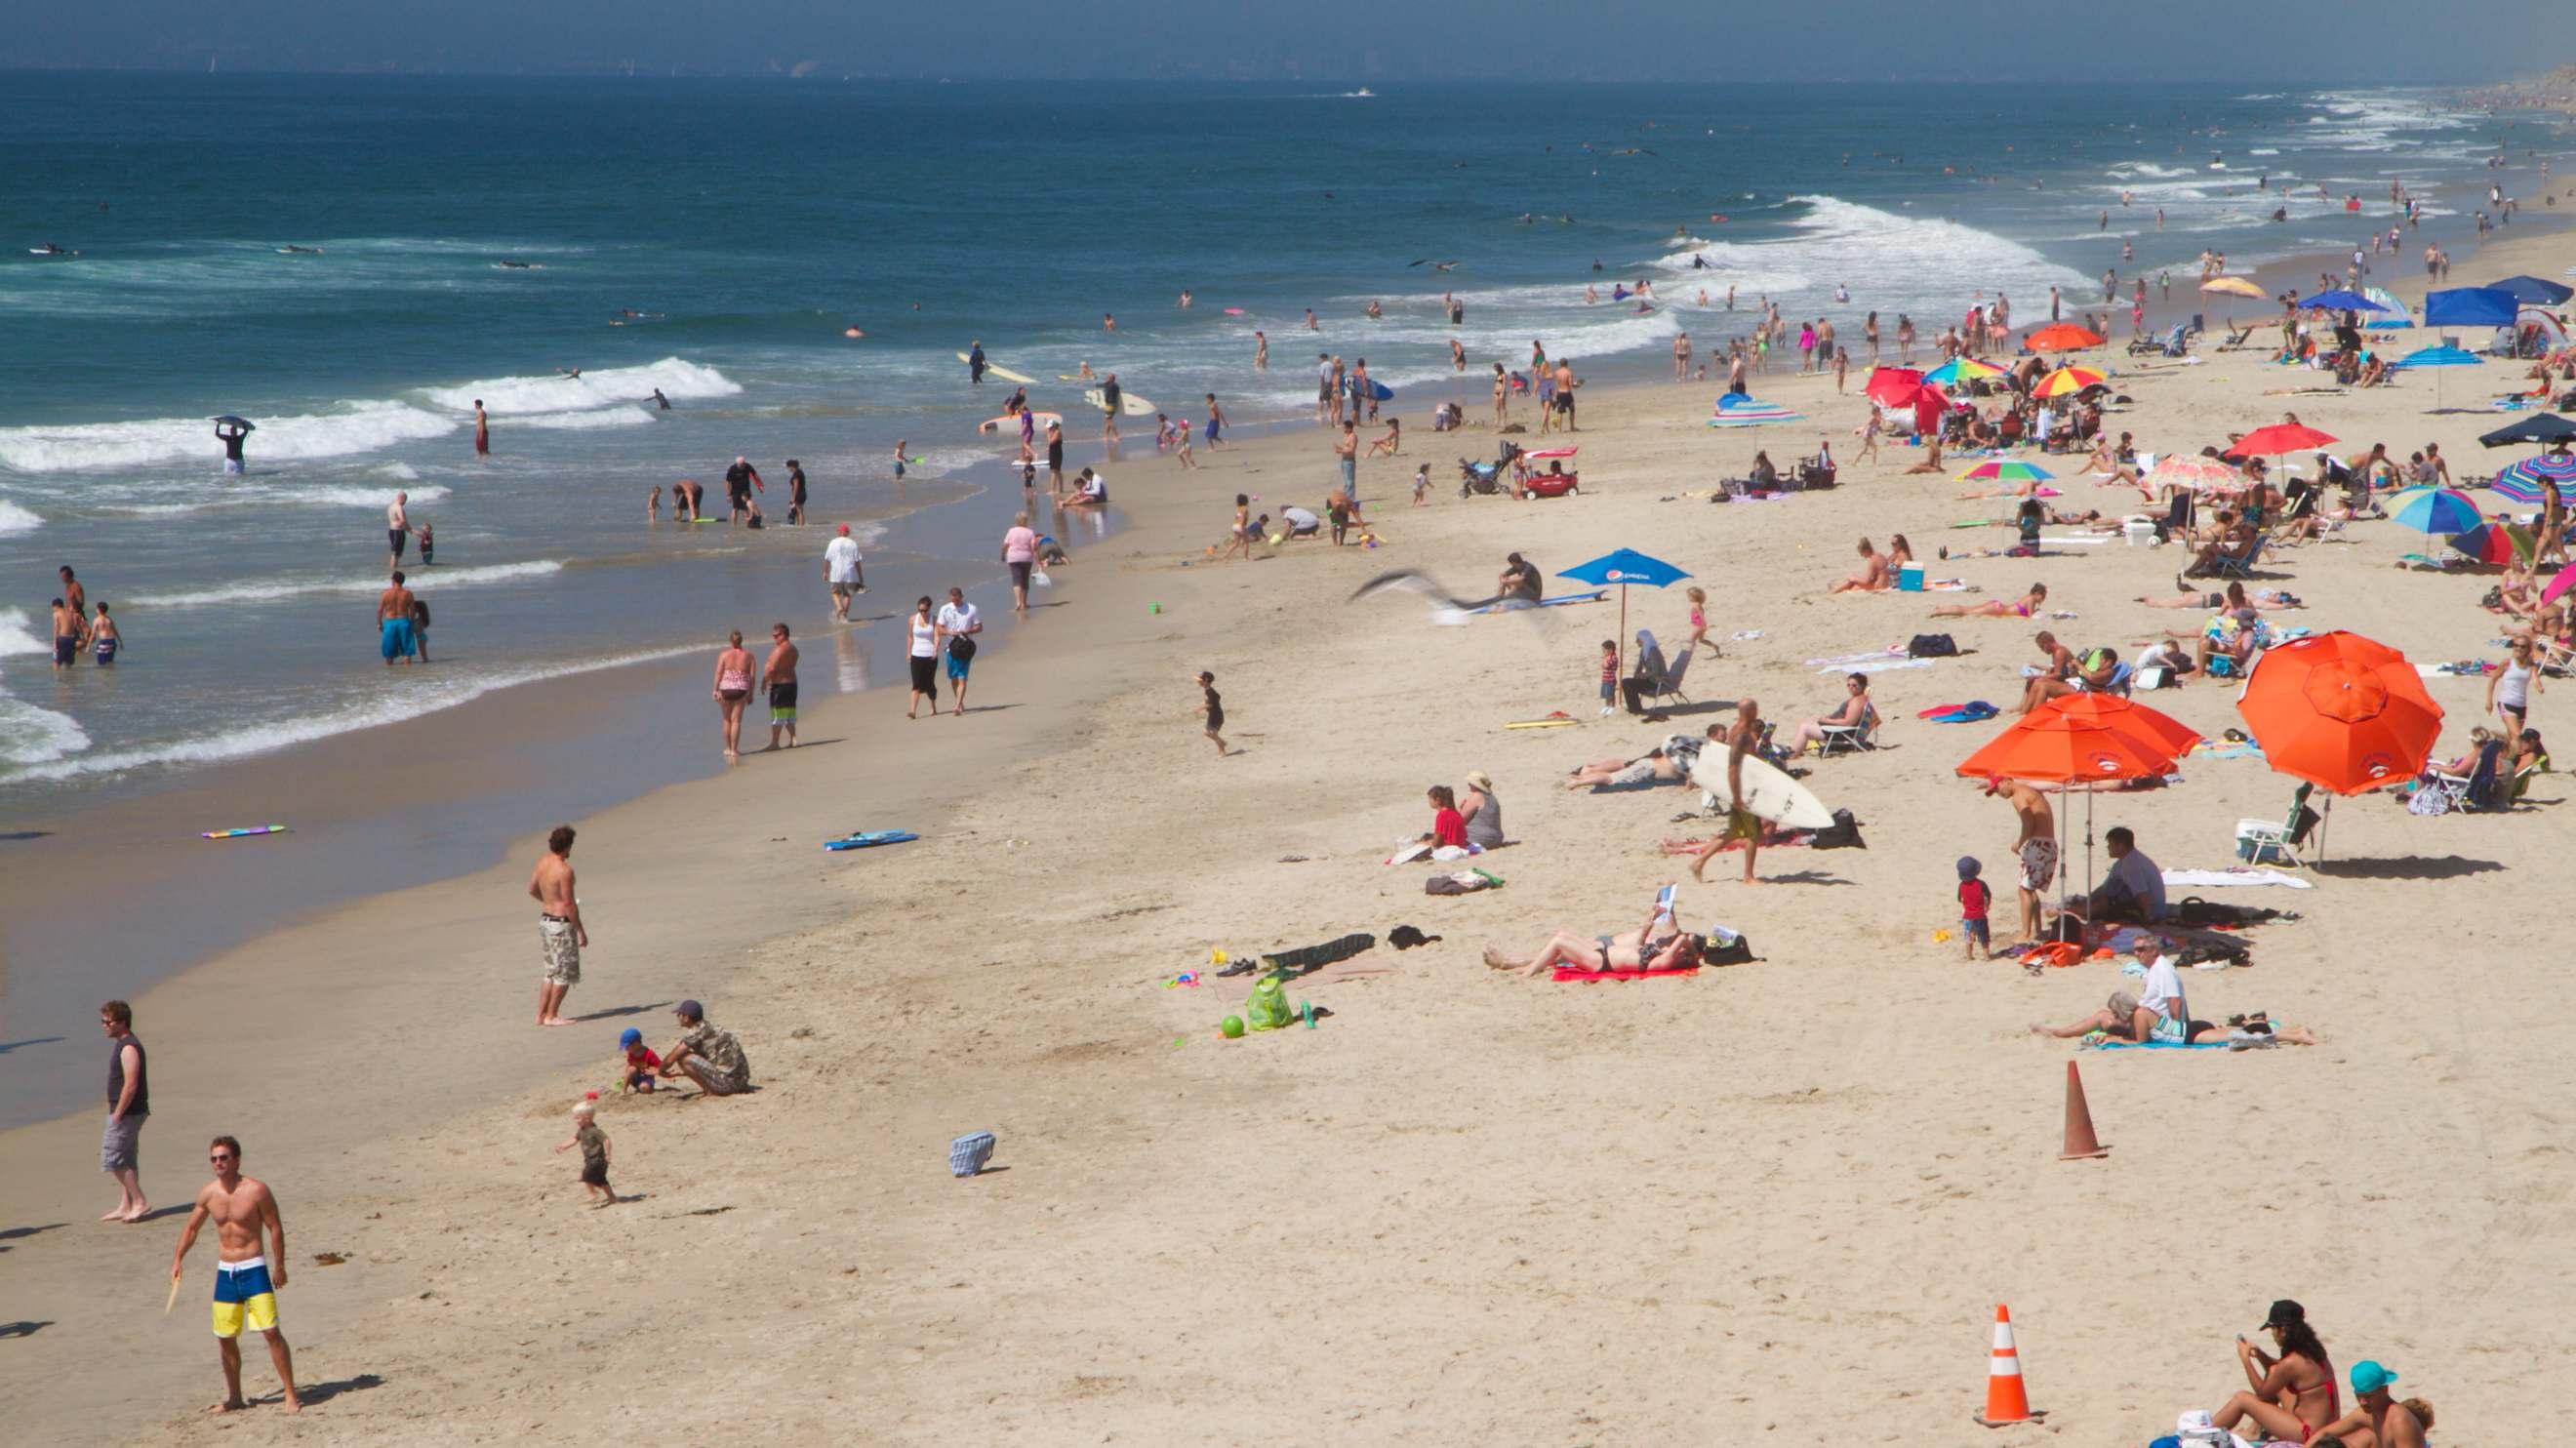 car rental huntington beach ca  Rental Cars Huntington Beach $20: Get Cheap Rental Car Deals Now ...